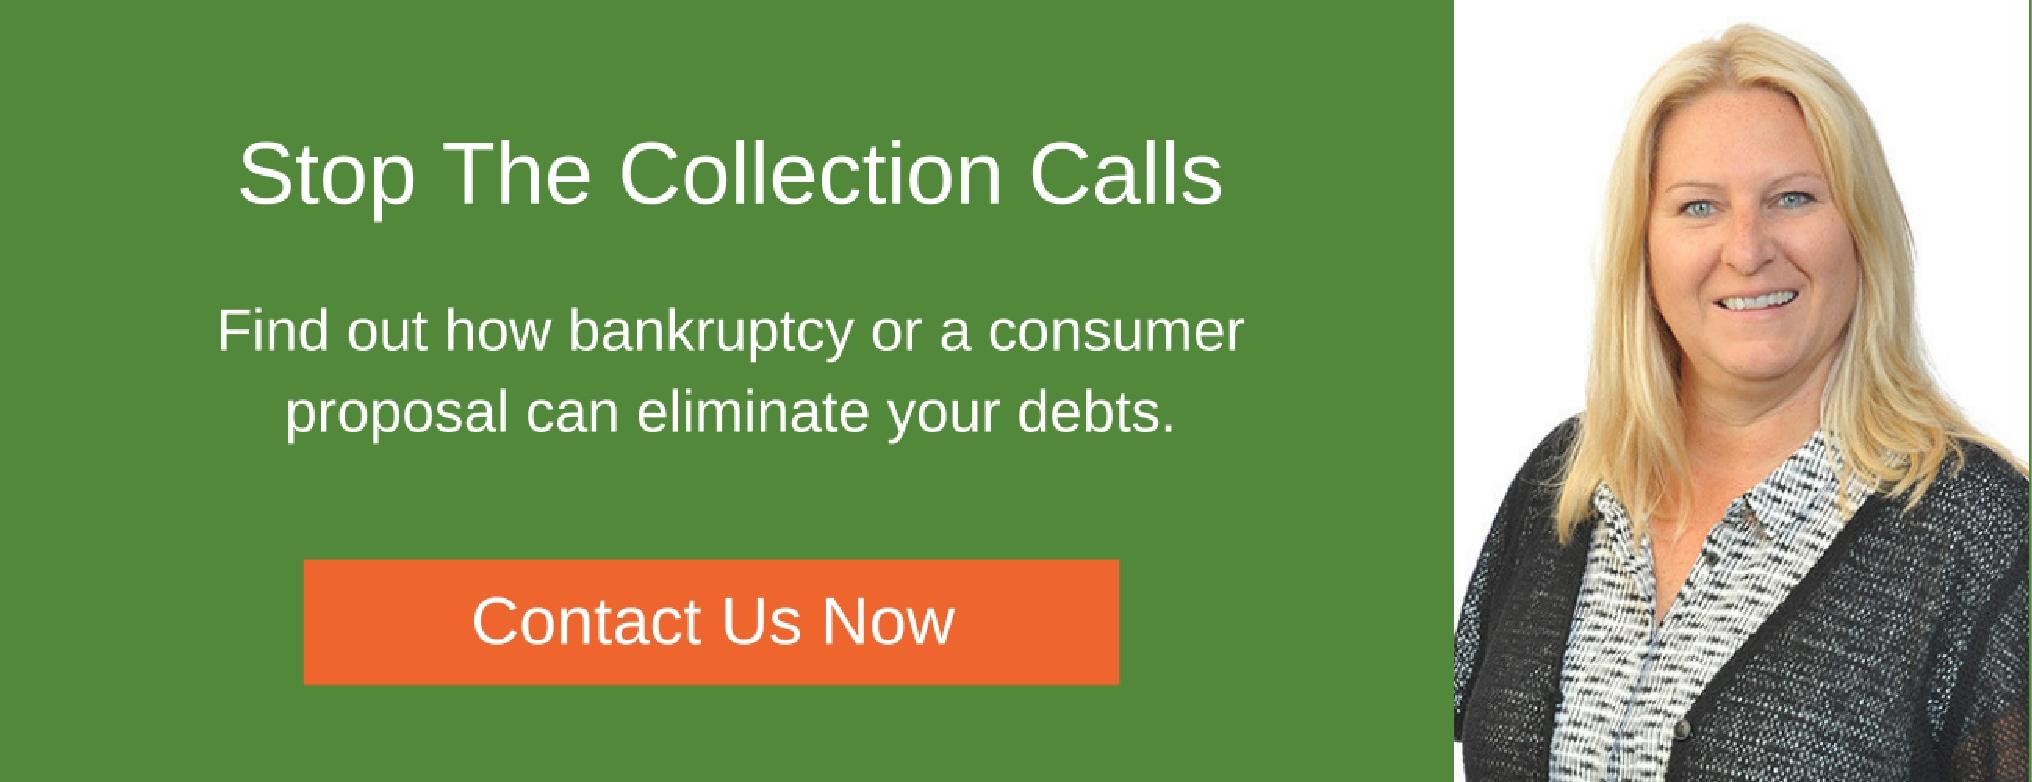 janette-collection-calls-cta